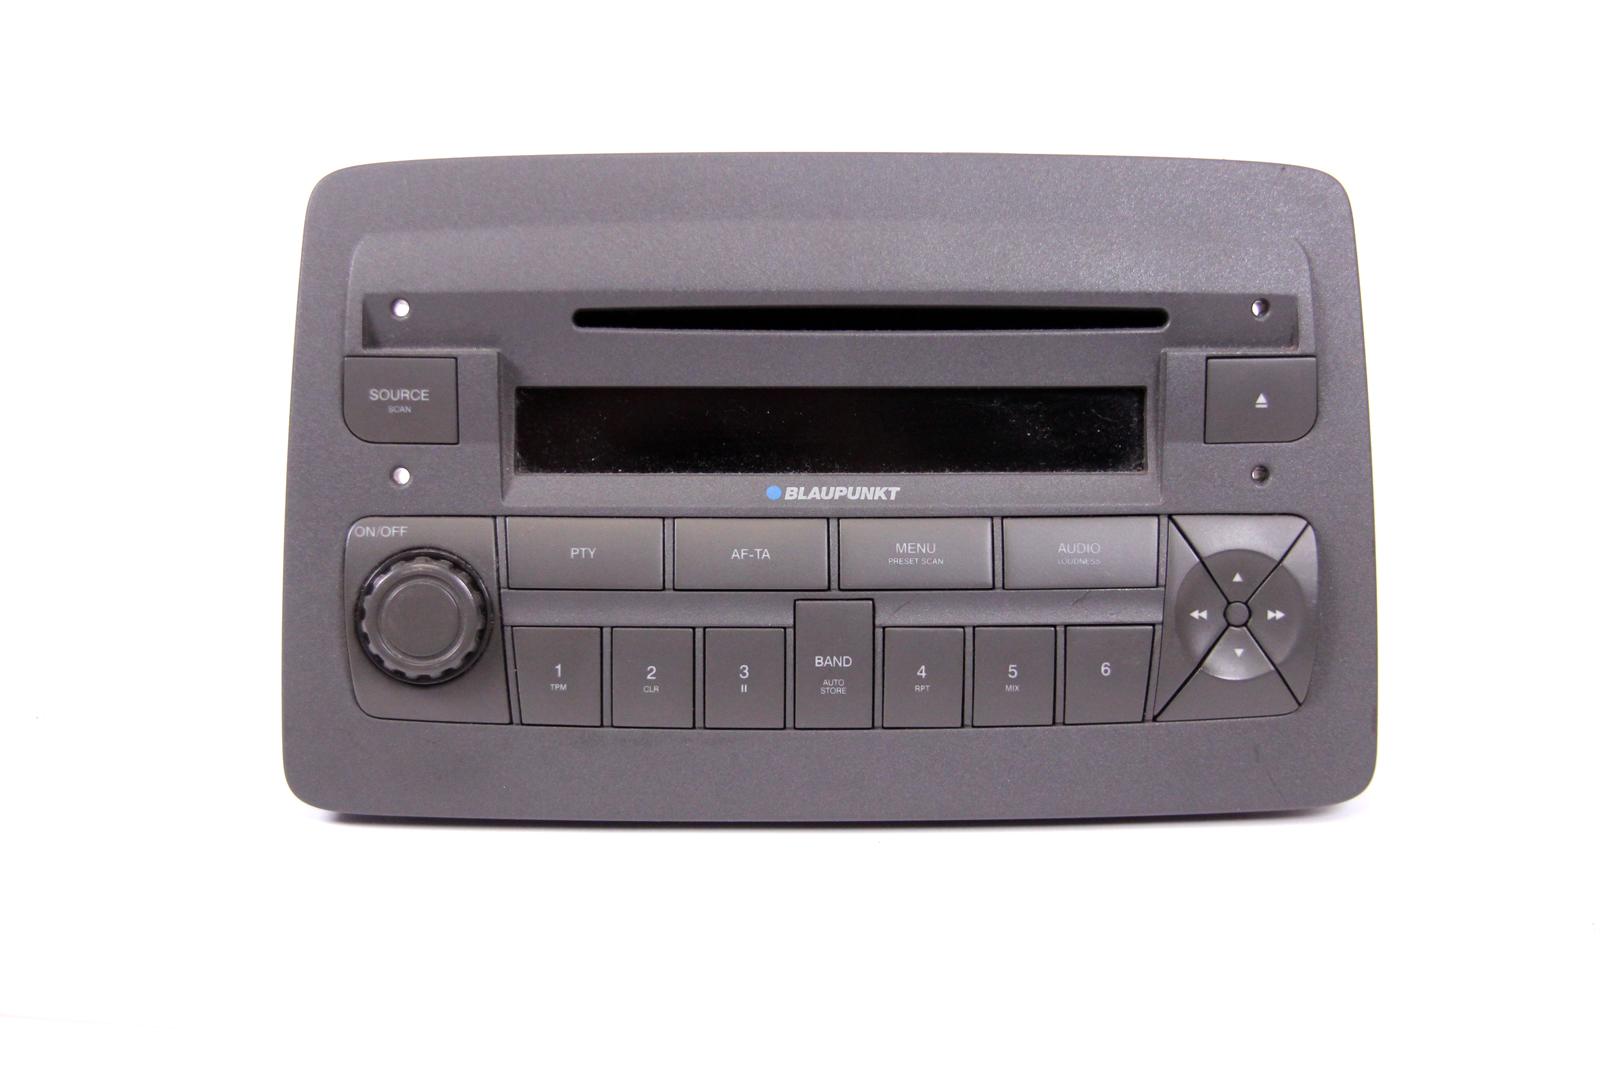 fiat panda autoradio cd radio player blaupunkt 7643363316 169 cd radio code ebay. Black Bedroom Furniture Sets. Home Design Ideas